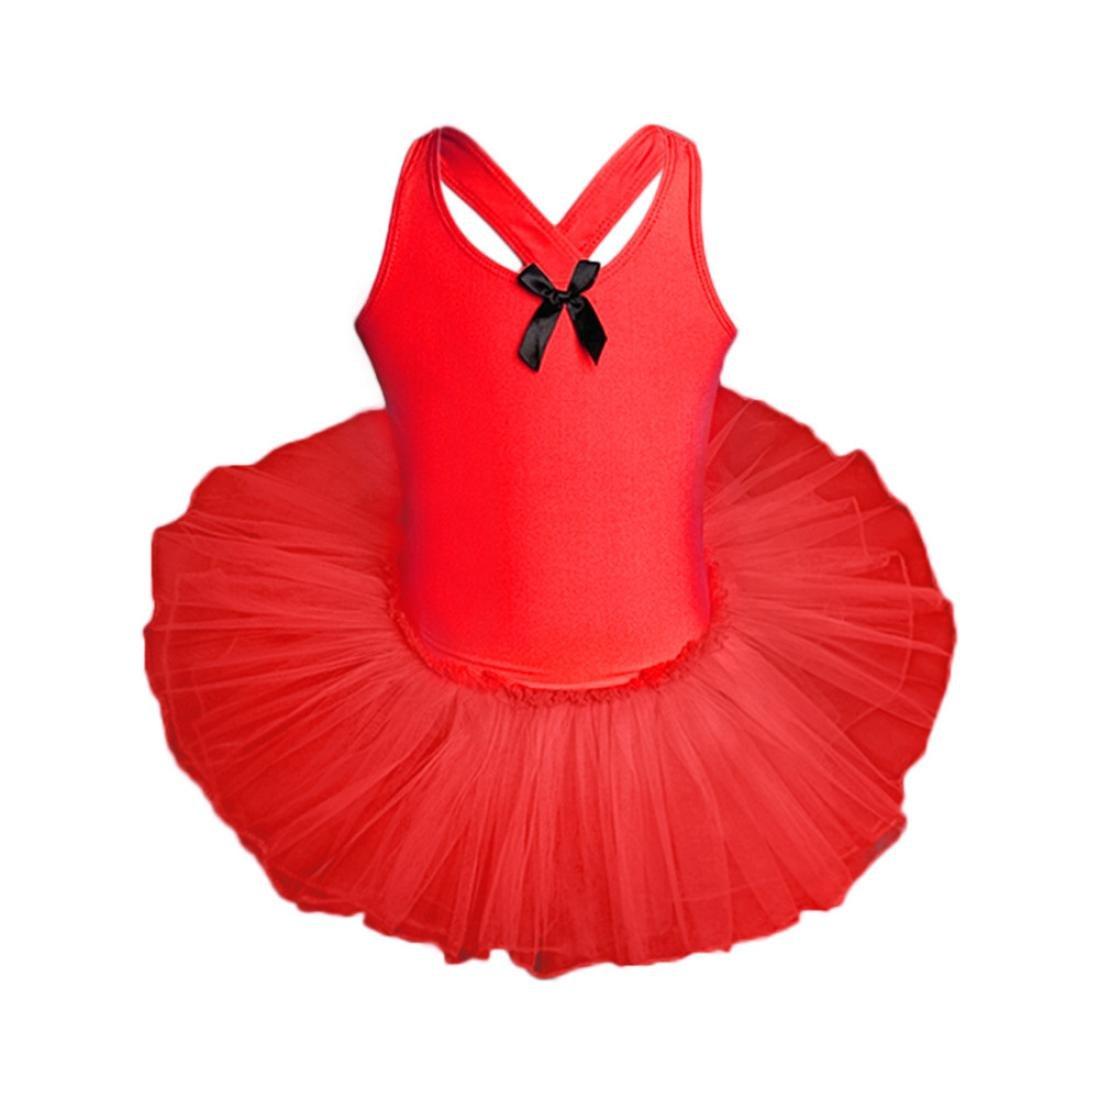 d286f5cad35d Amazon.com: Goodlock Toddler Kids Fashion Dress Baby Girls Gauze Leotards  Ballet Bodysuit Dancewear Dress Clothes Outfits: Clothing